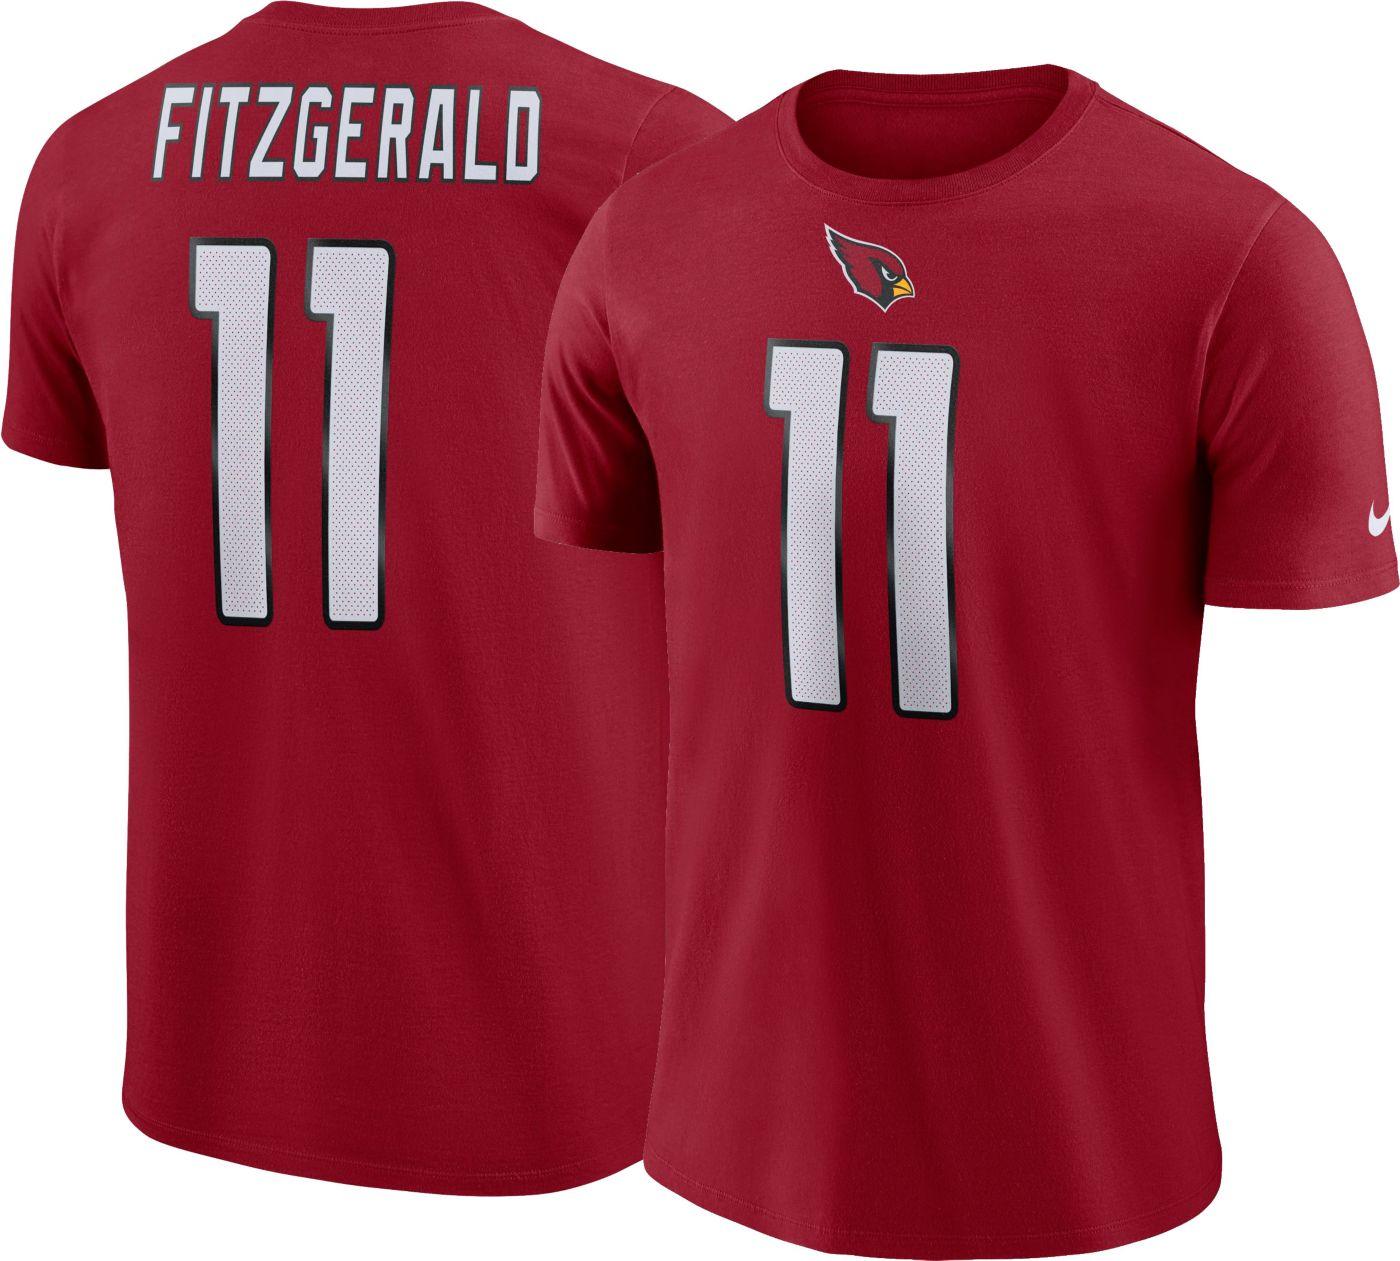 Larry Fitzgerald #11 Nike Men's Arizona Cardinals Pride Red T-Shirt